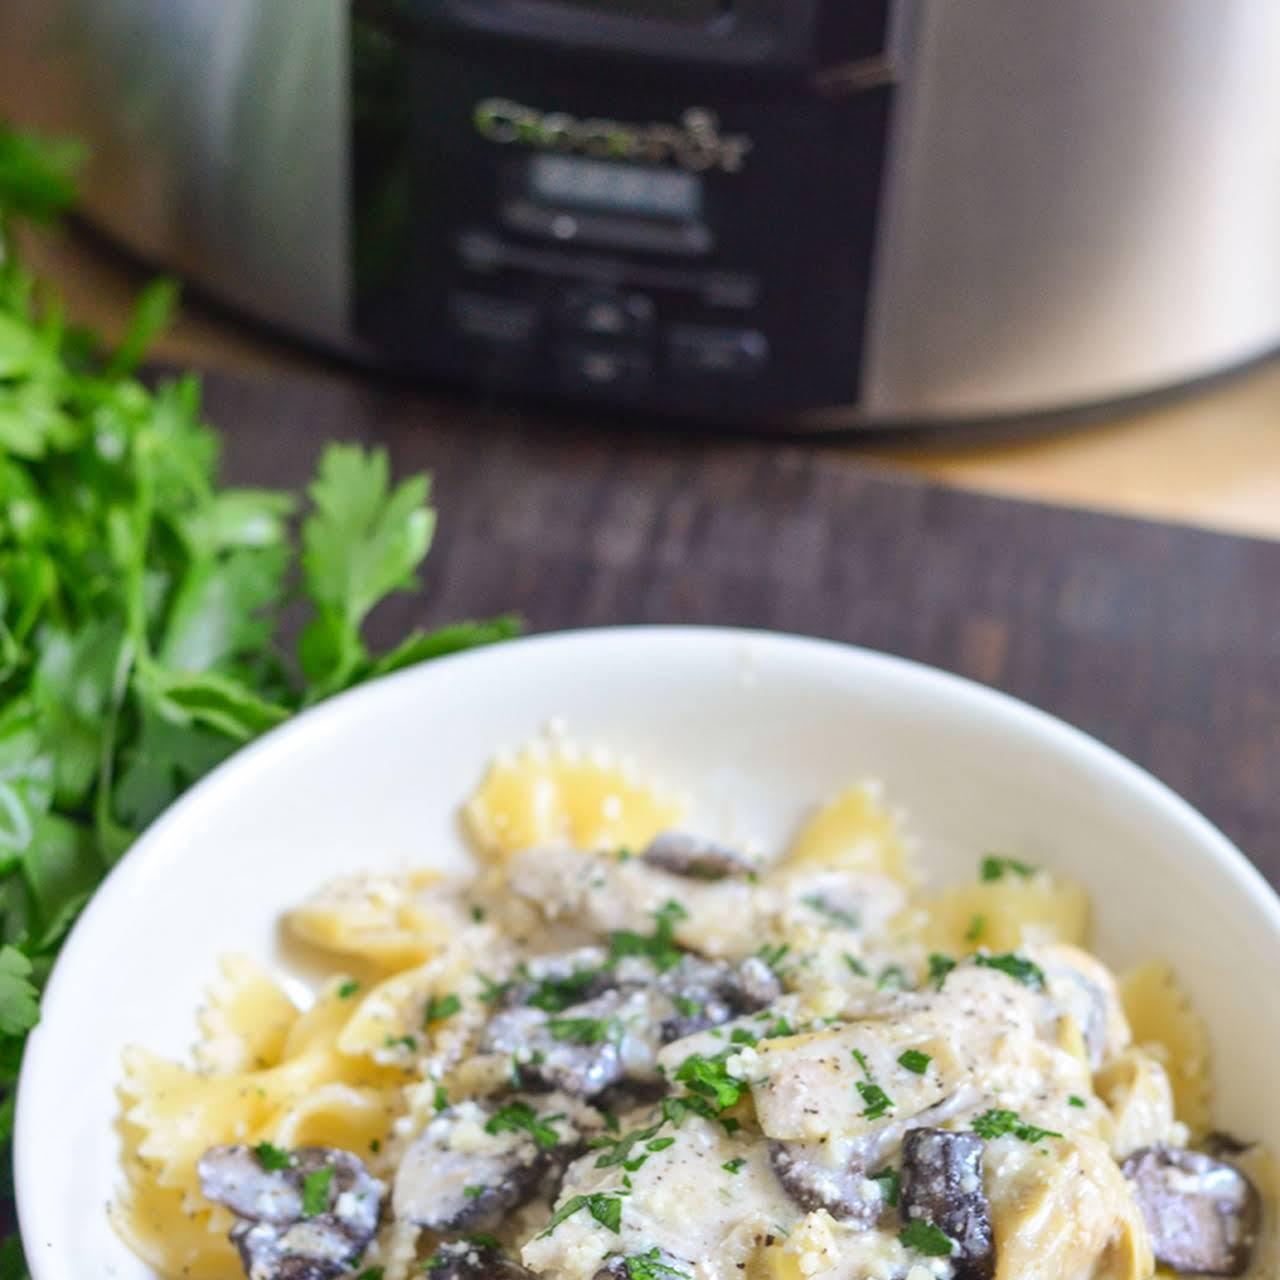 Creamy Crock-pot® Slow Cooker Chicken  next Mushrooms and Artichokes